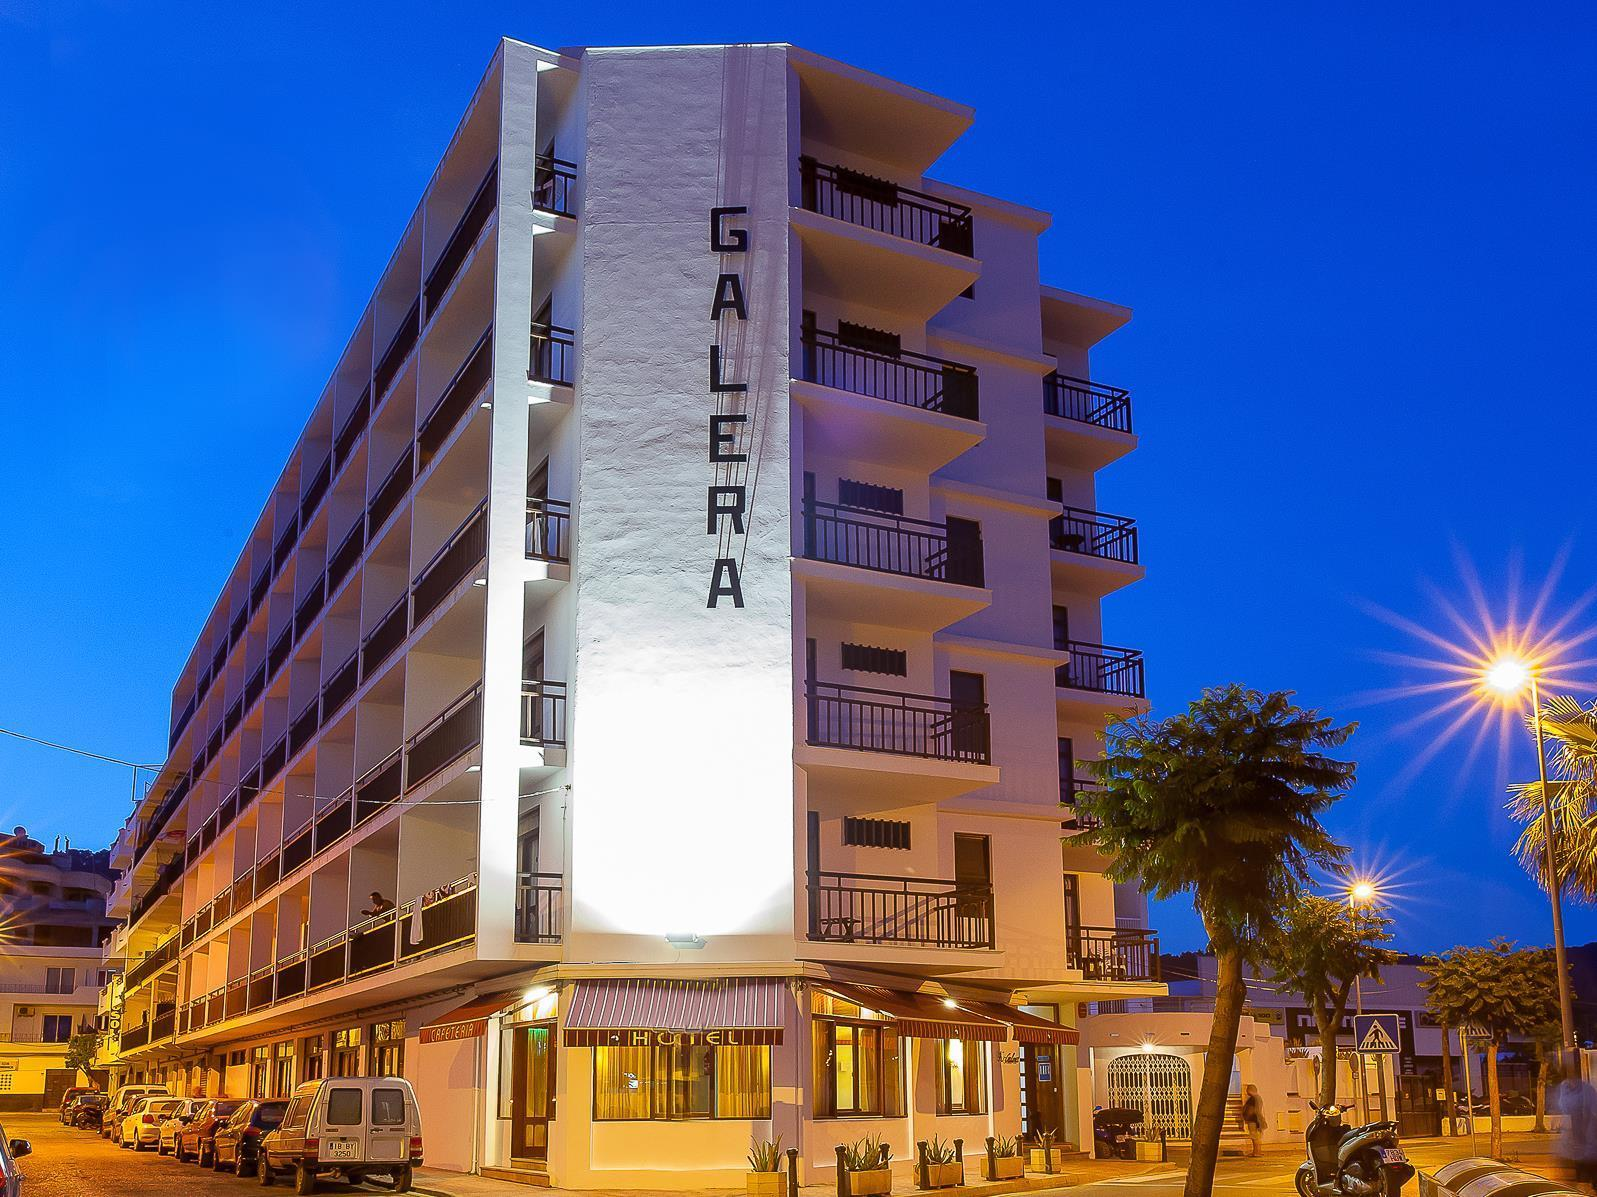 Hotel Residencia Galera